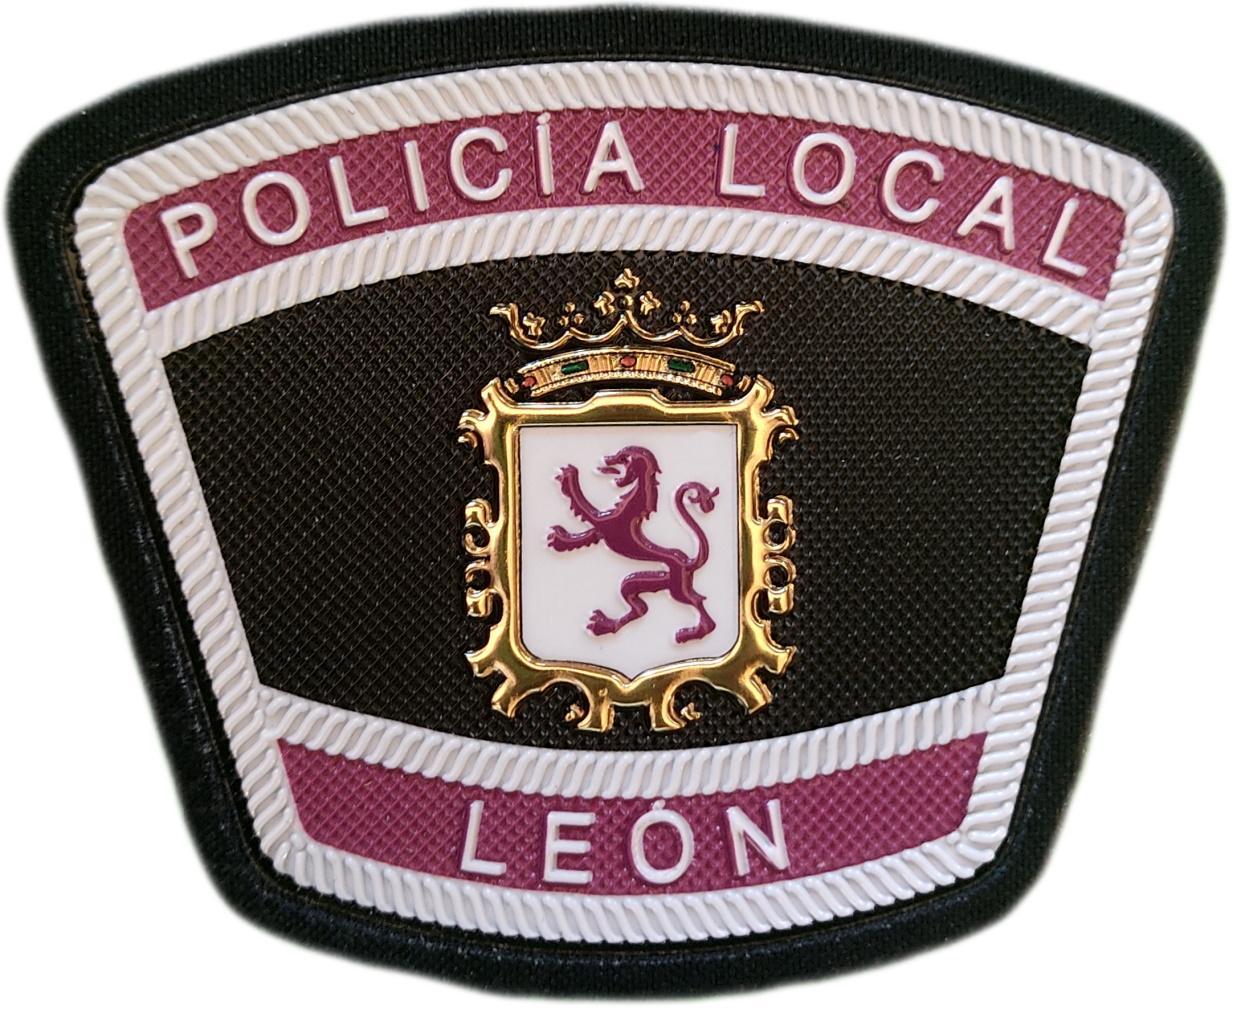 Policía Local León parche insignia emblema distintivo